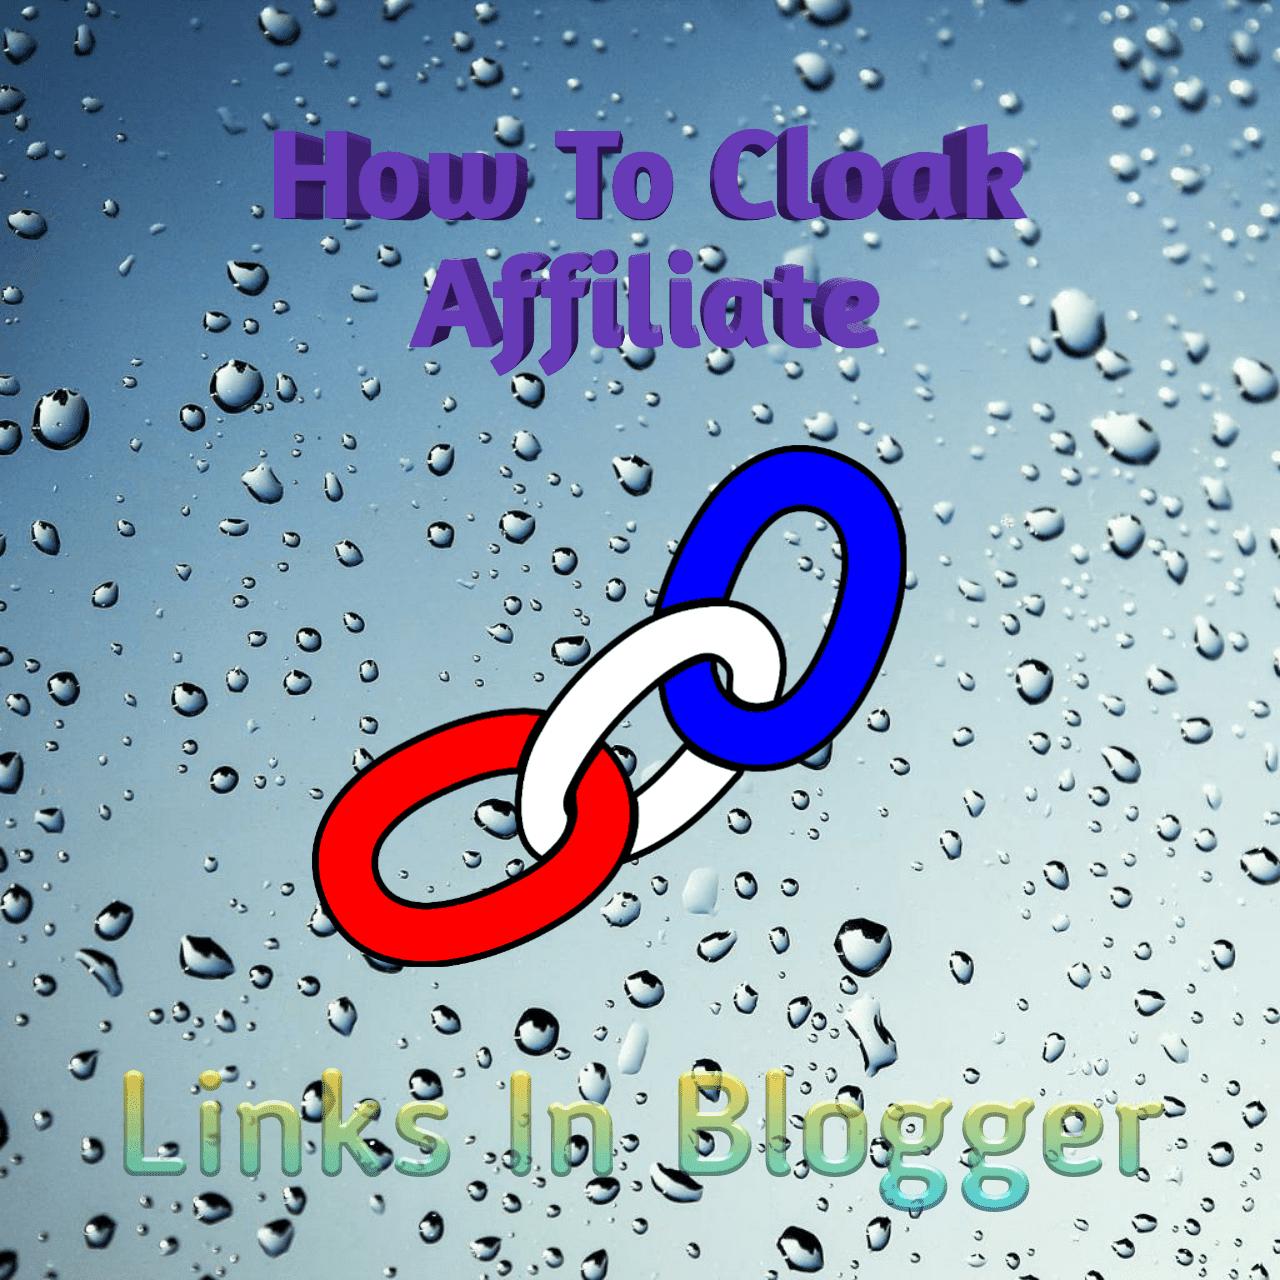 Cloak-affiliate-links-in-blogger